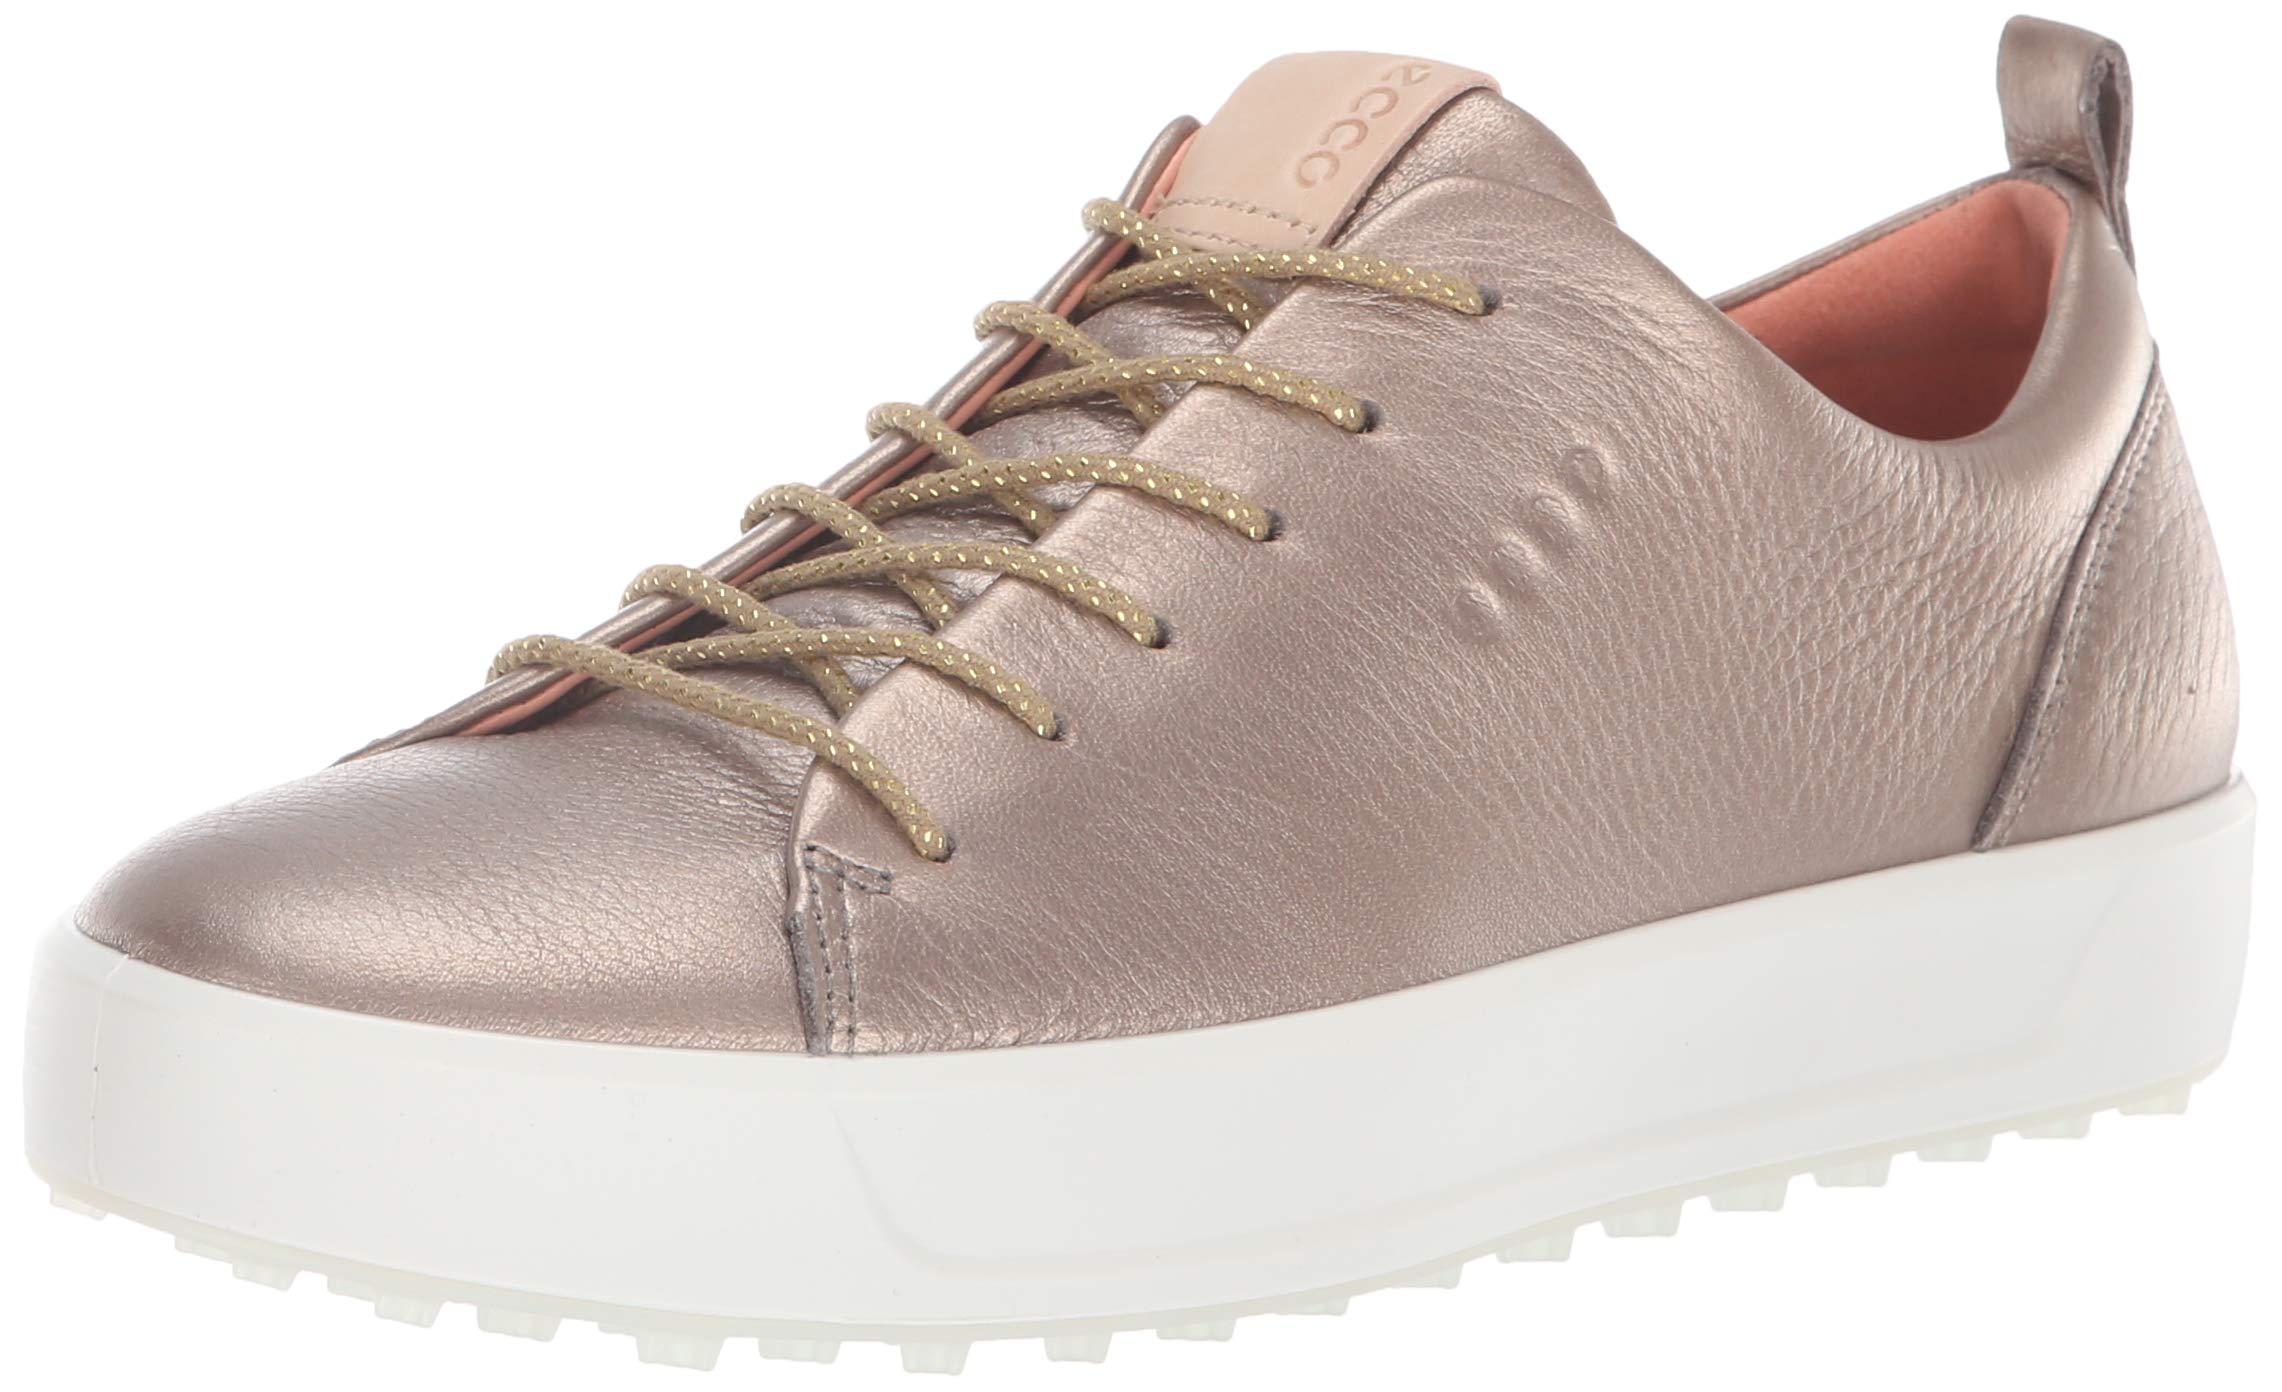 ECCO Women's Soft Low Hydromax Golf Shoe, Warm Grey/Metallic, 36 M EU (5-5.5 US)